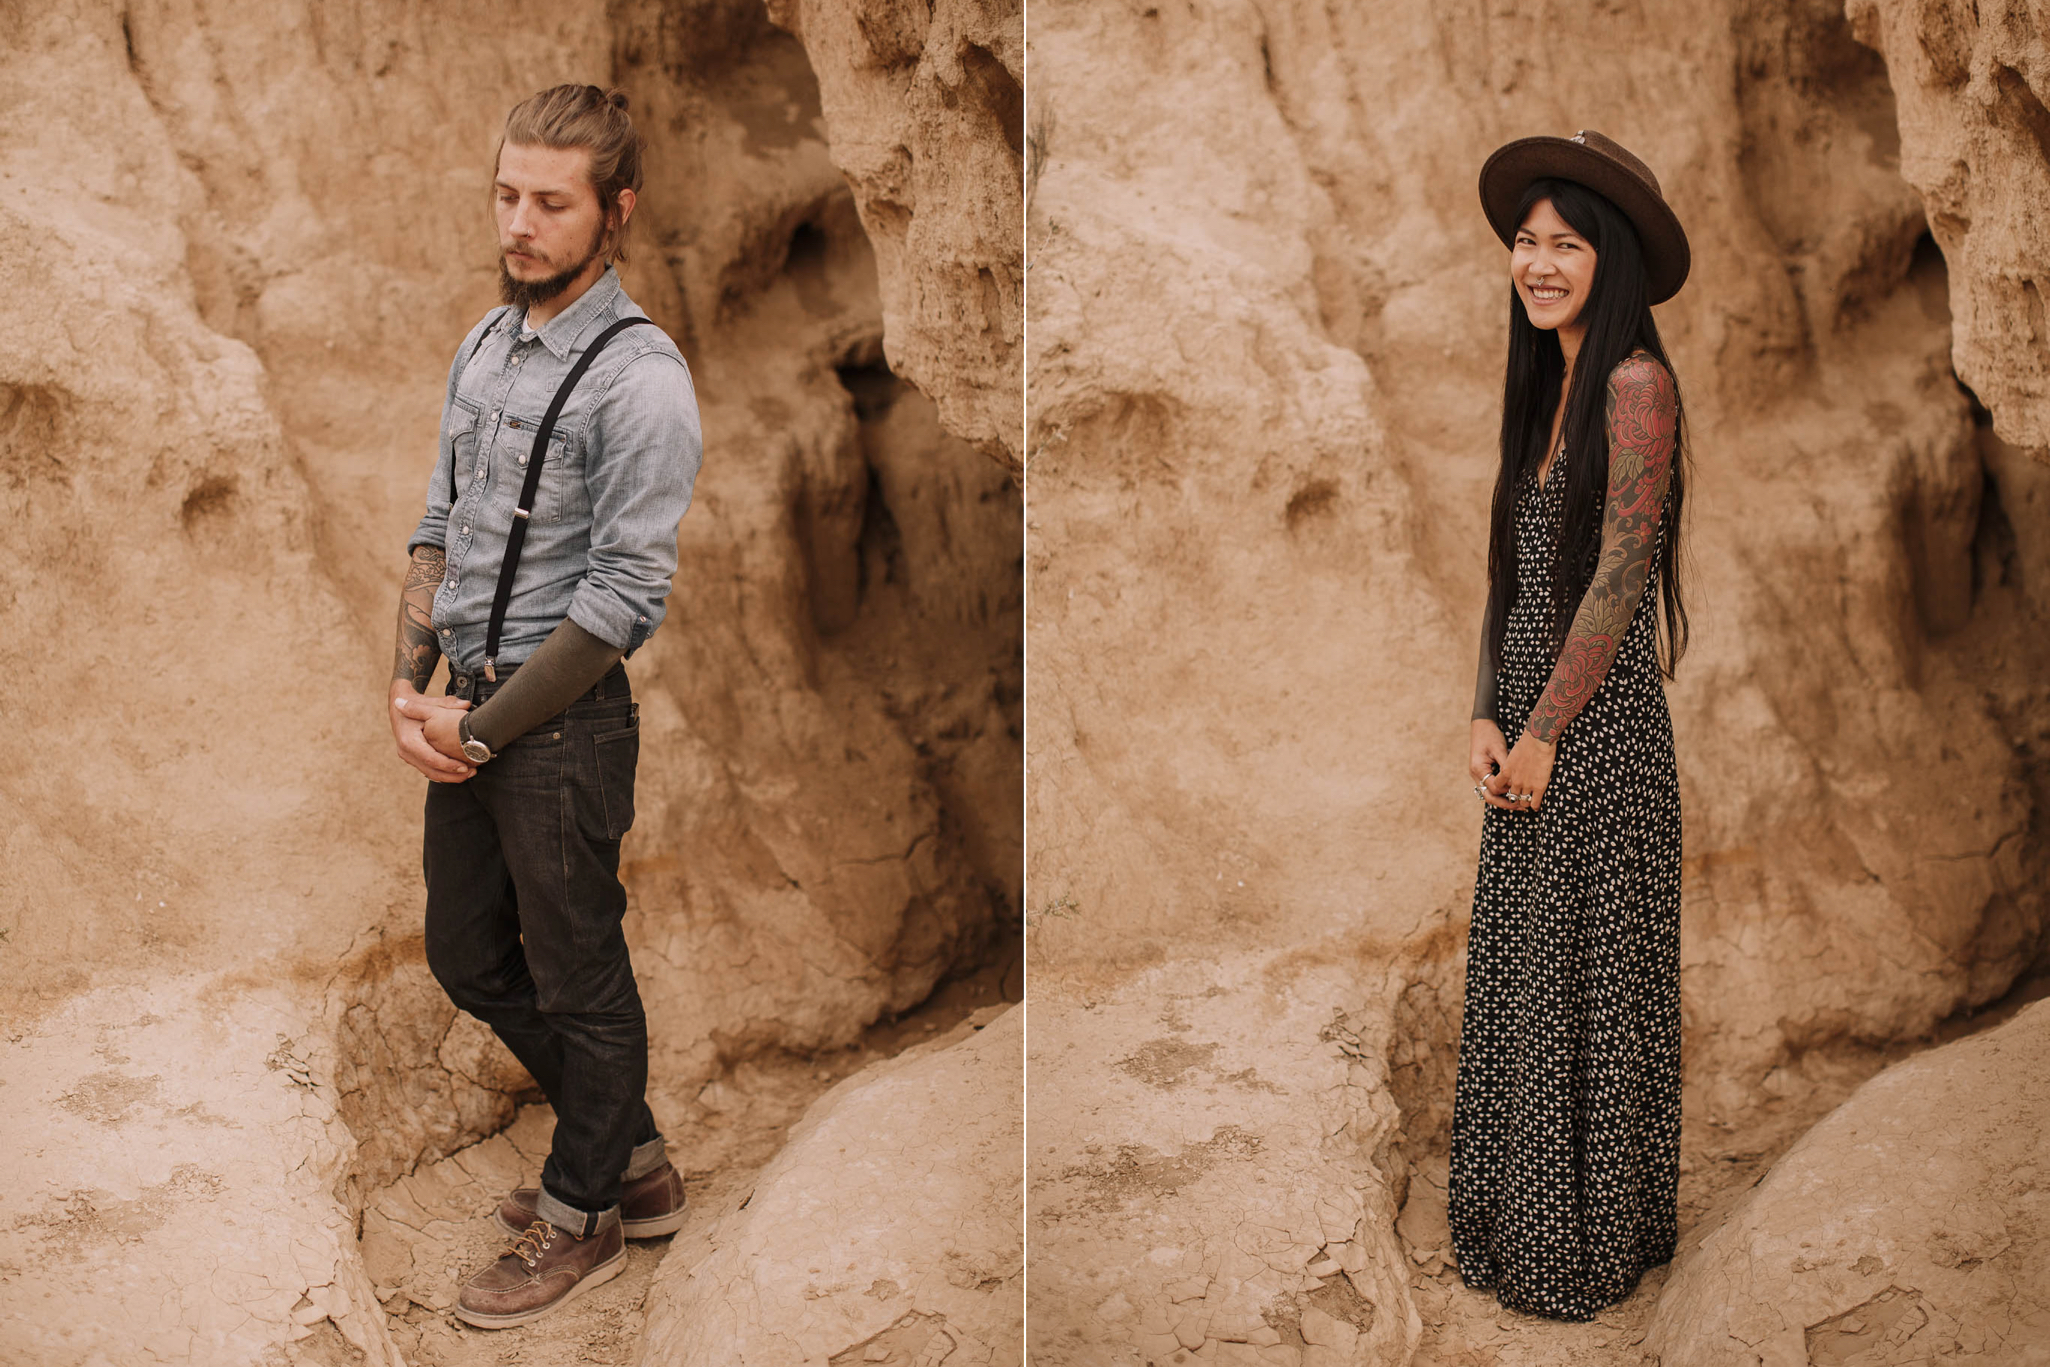 Spain-wedding-photographer-bardenas-reales-jeremy-boyer-photographe-mariage-bordeaux-floral-wedding-dress-robe-31.jpg